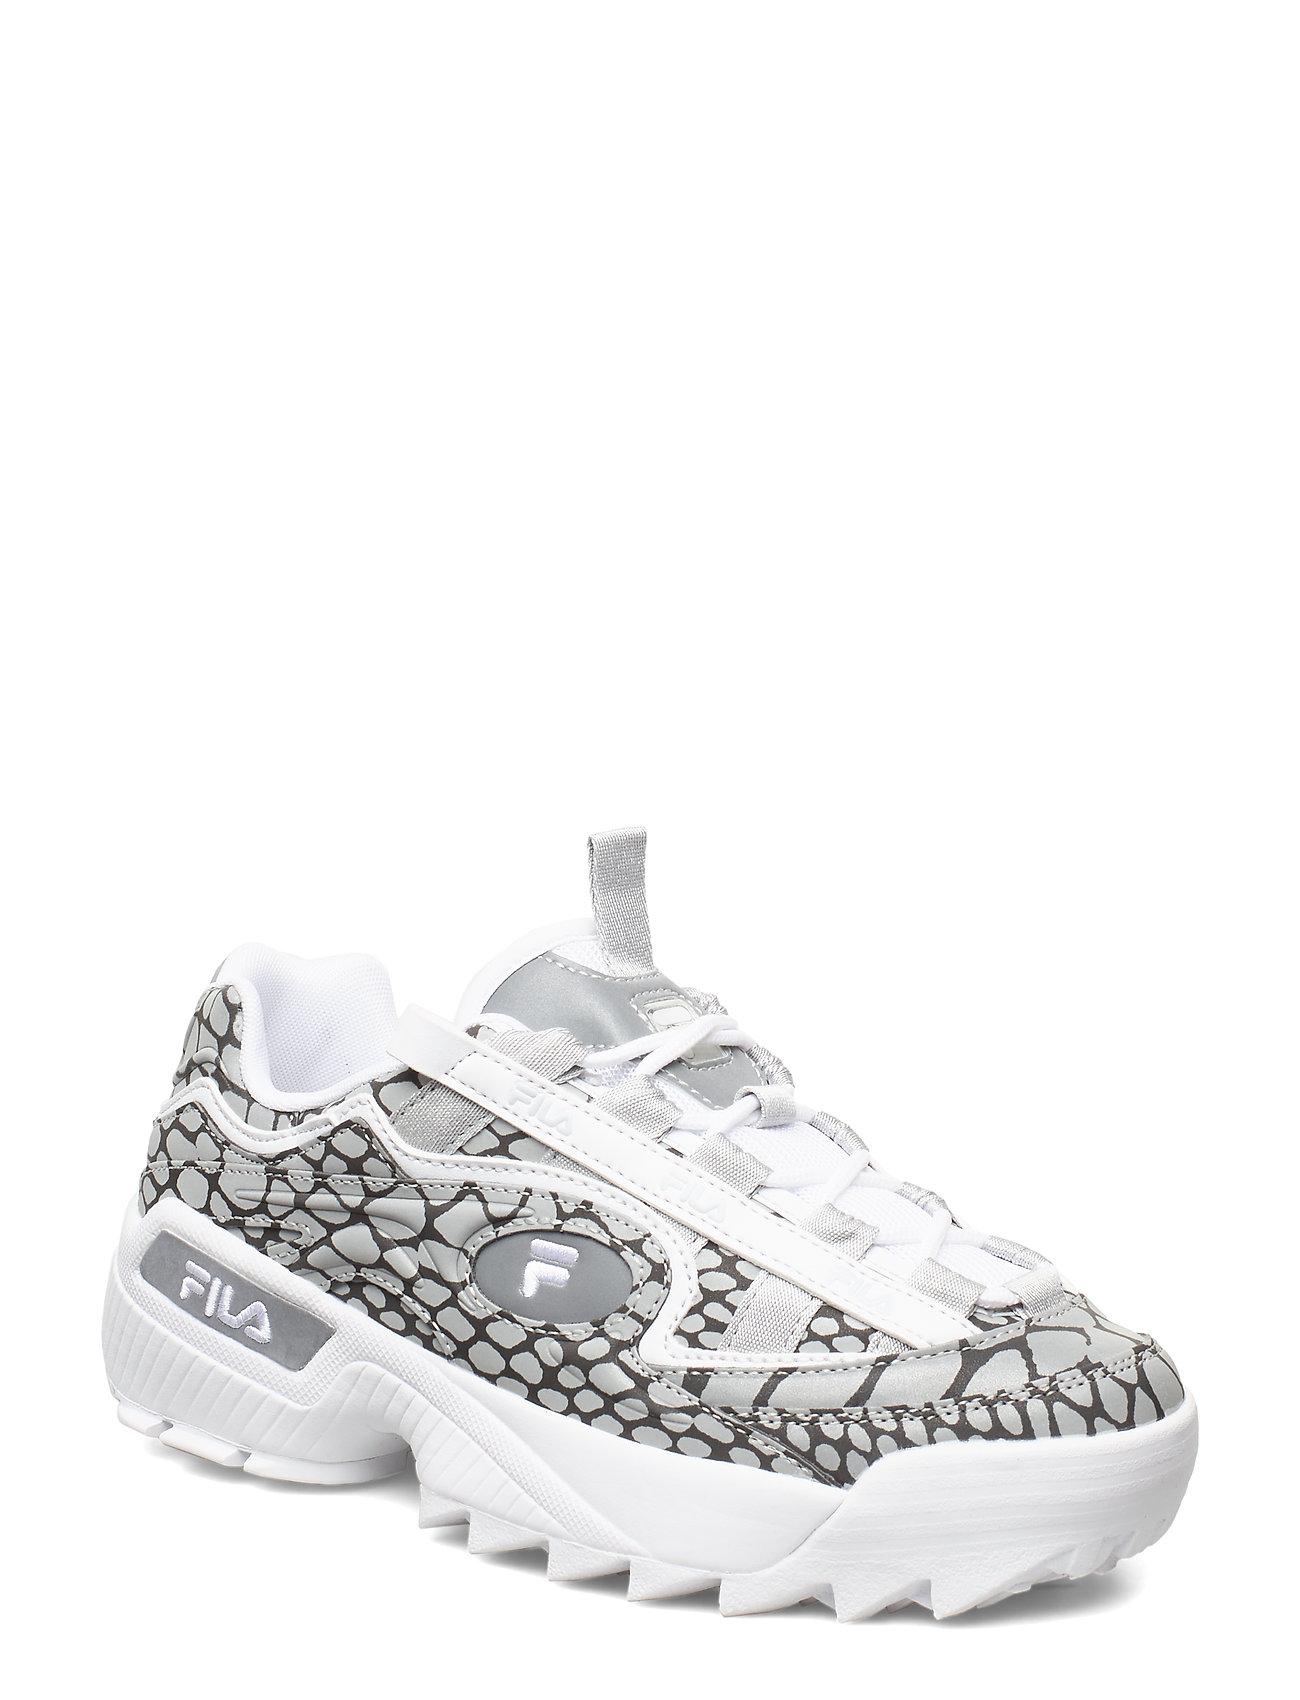 Image of D-Formation R Wmn Low-top Sneakers Hvid FILA (3369206423)